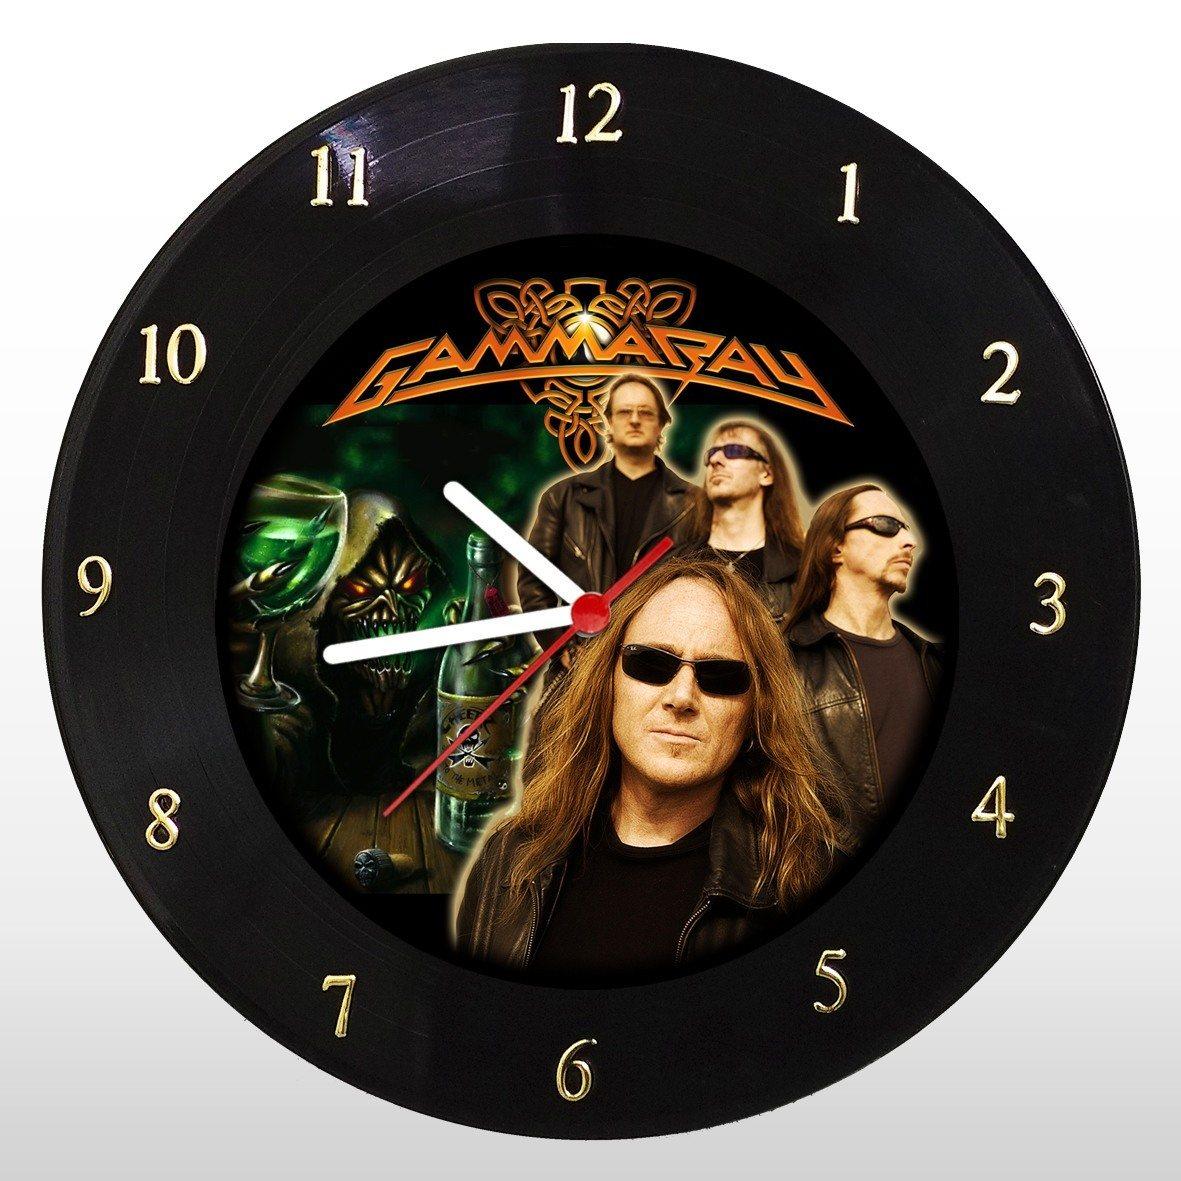 Gammaray -  Relógio de Parede em Disco de Vinil - Mr. Rock